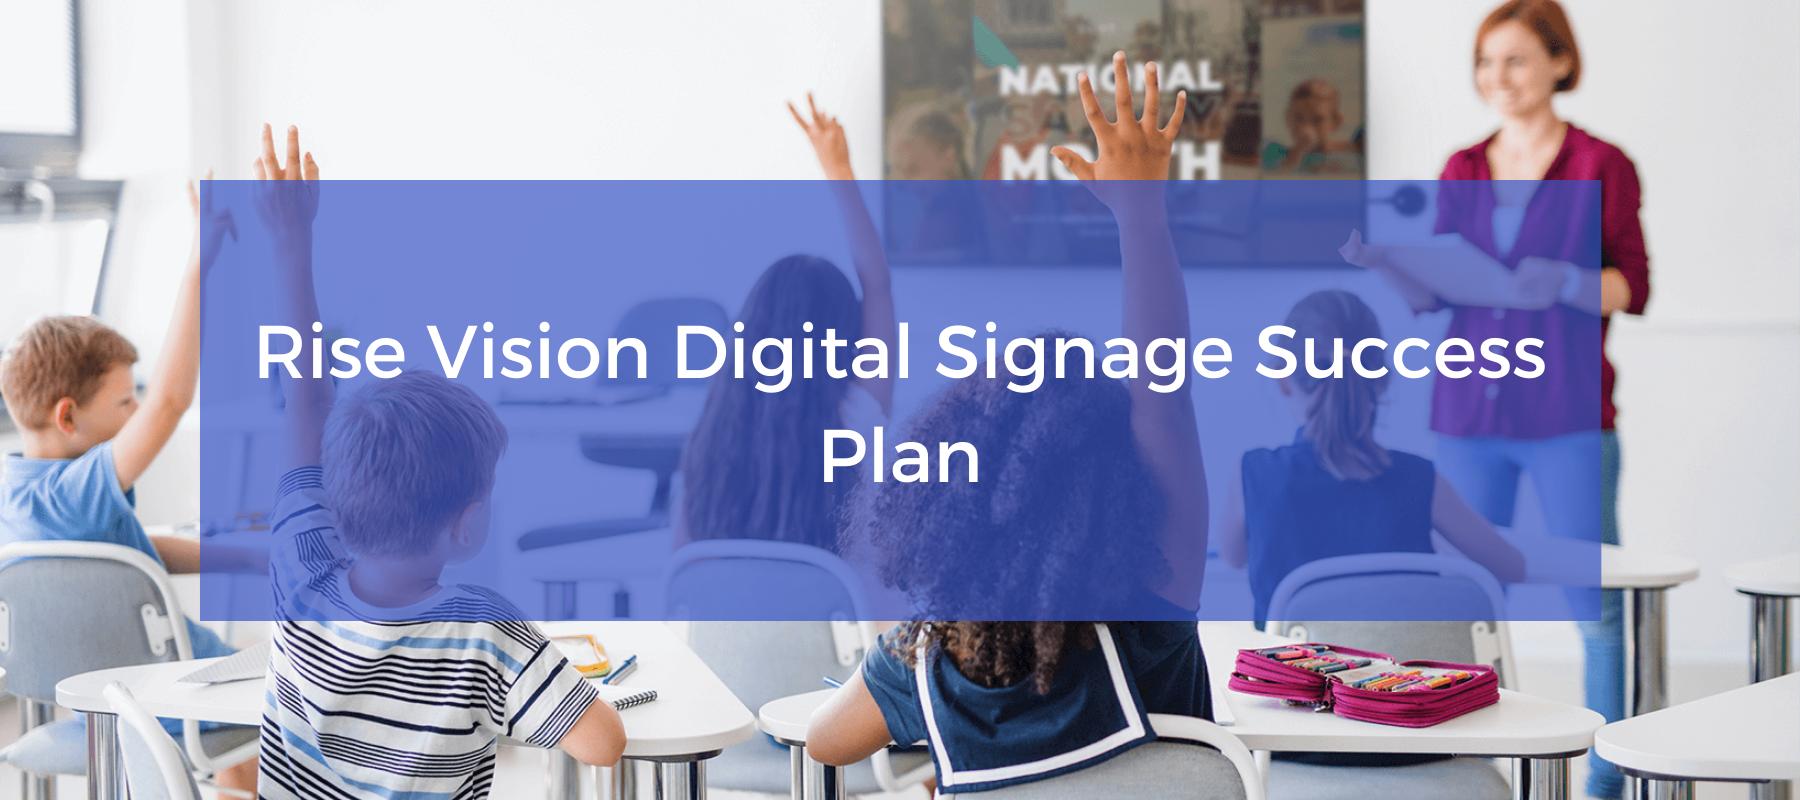 Rise Vision digital signage success plan